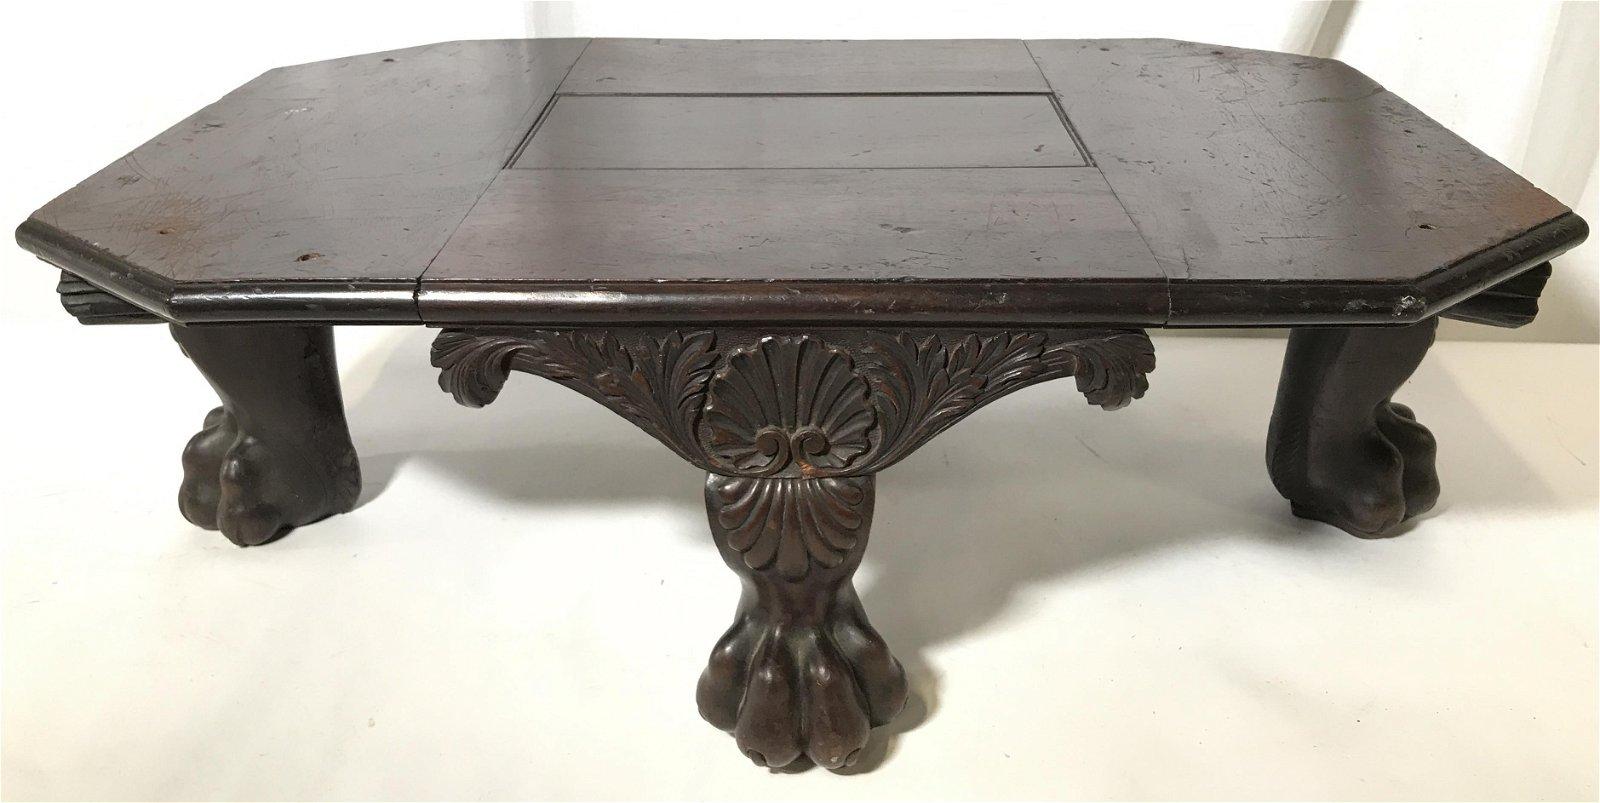 Antique Wooden Table Base, England